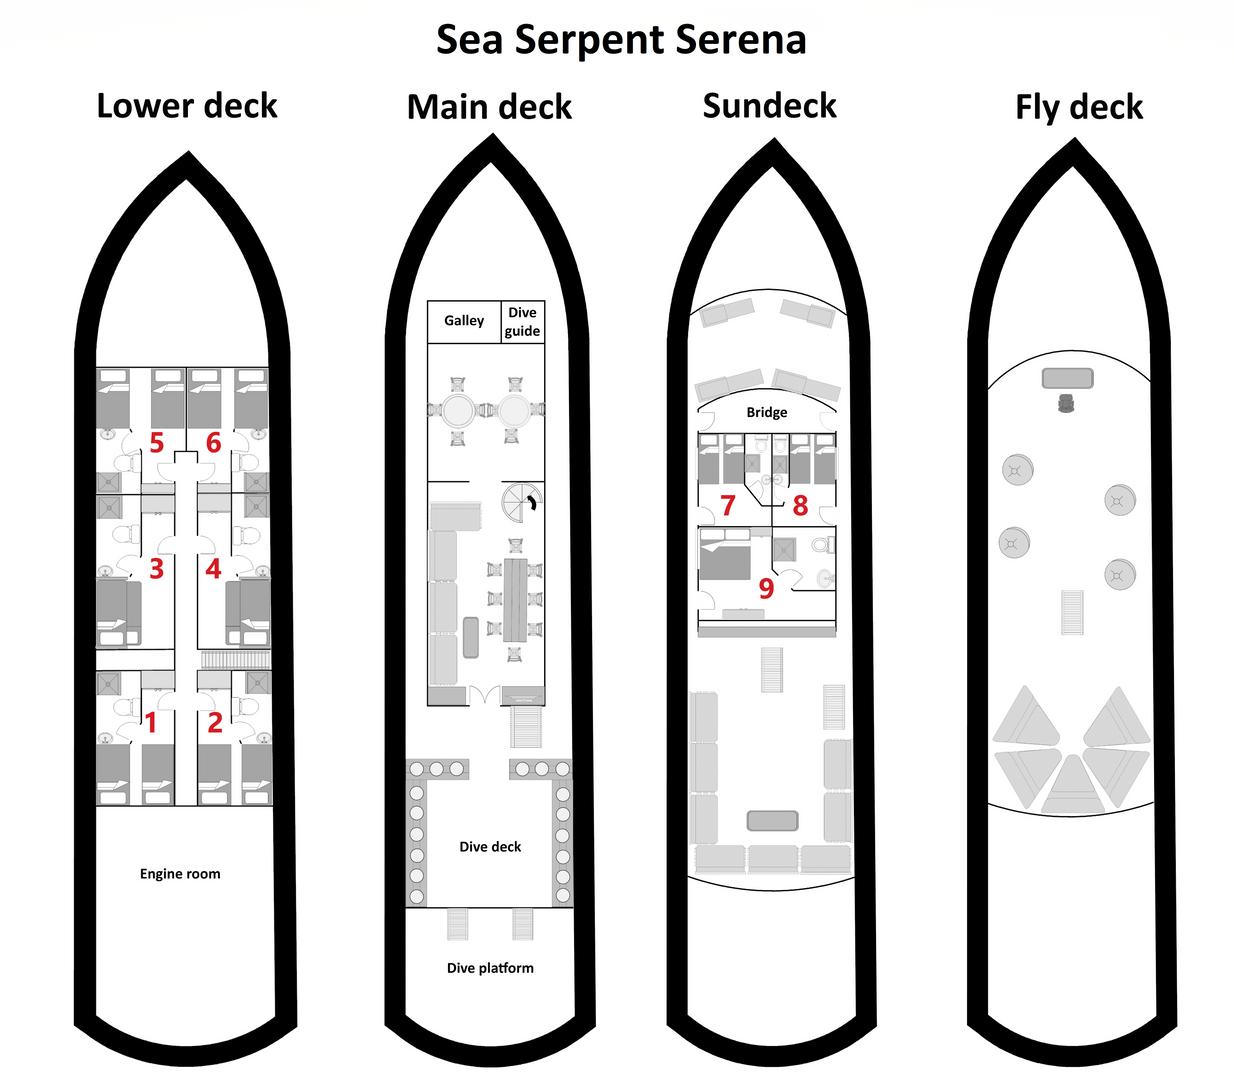 Sea_Serpent_Serena_deck_plan_2020.png